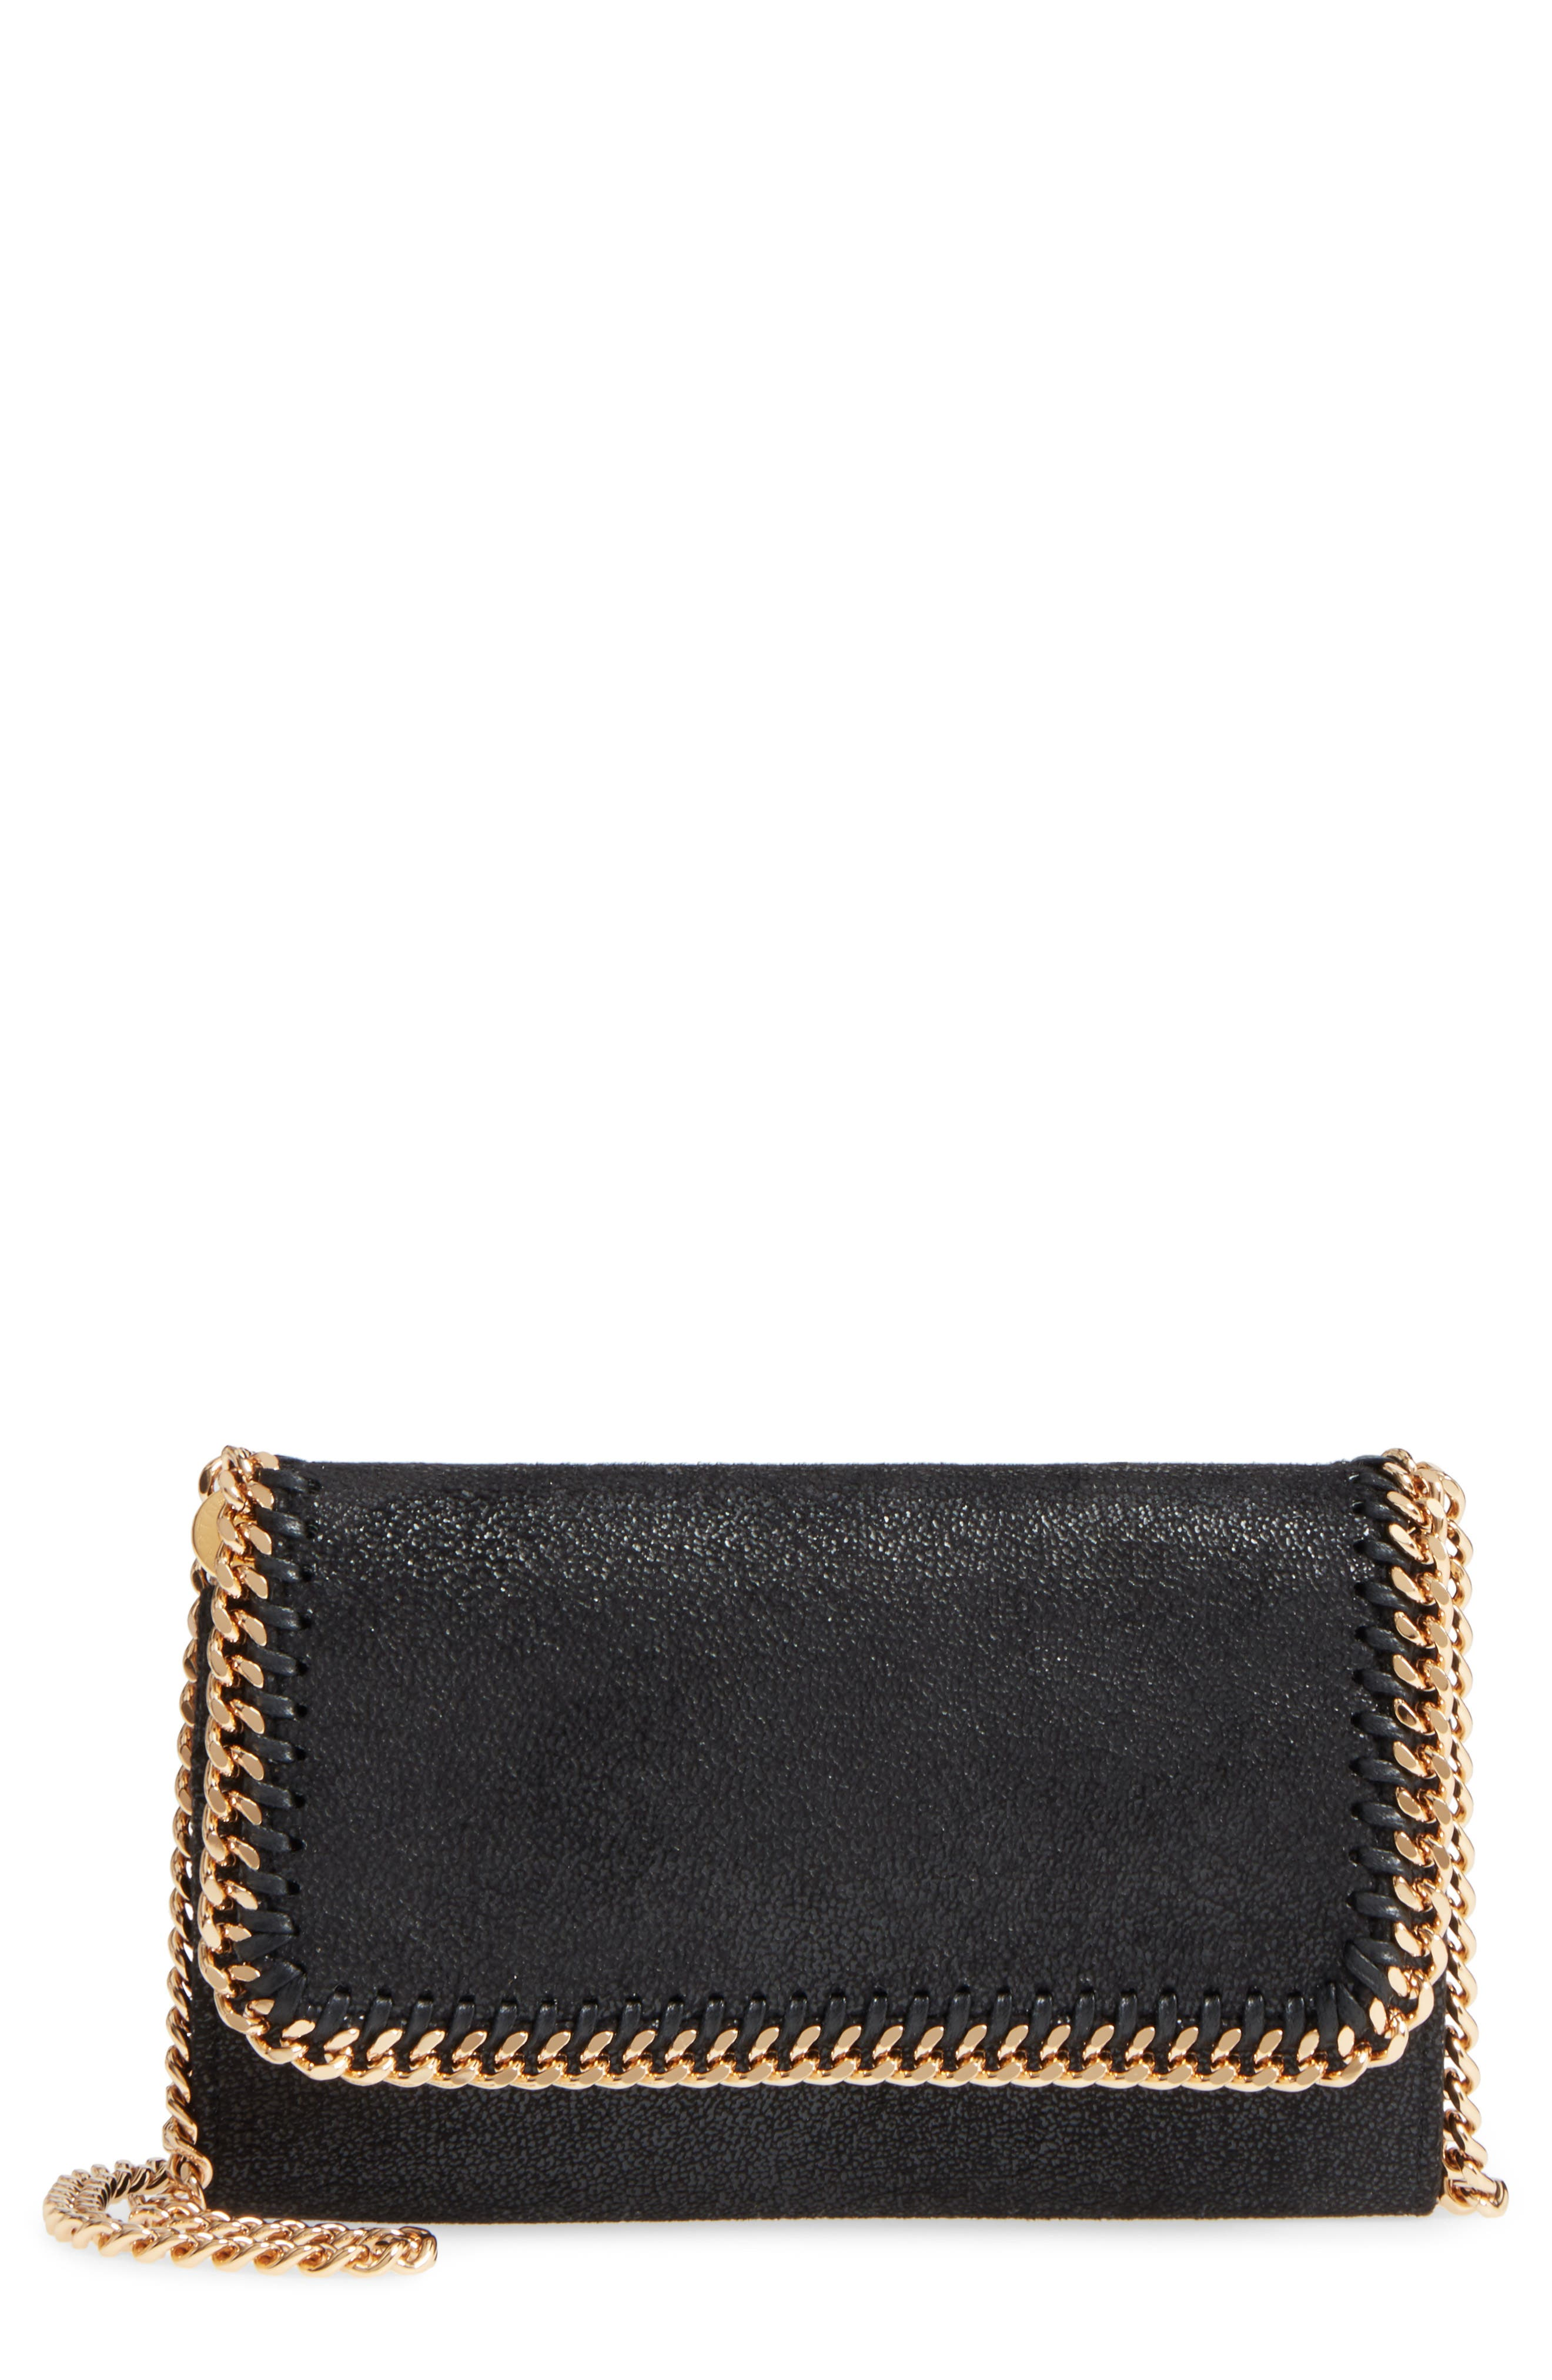 STELLA MCCARTNEY Shaggy Deer Faux Leather Crossbody Bag, Main, color, BLACK